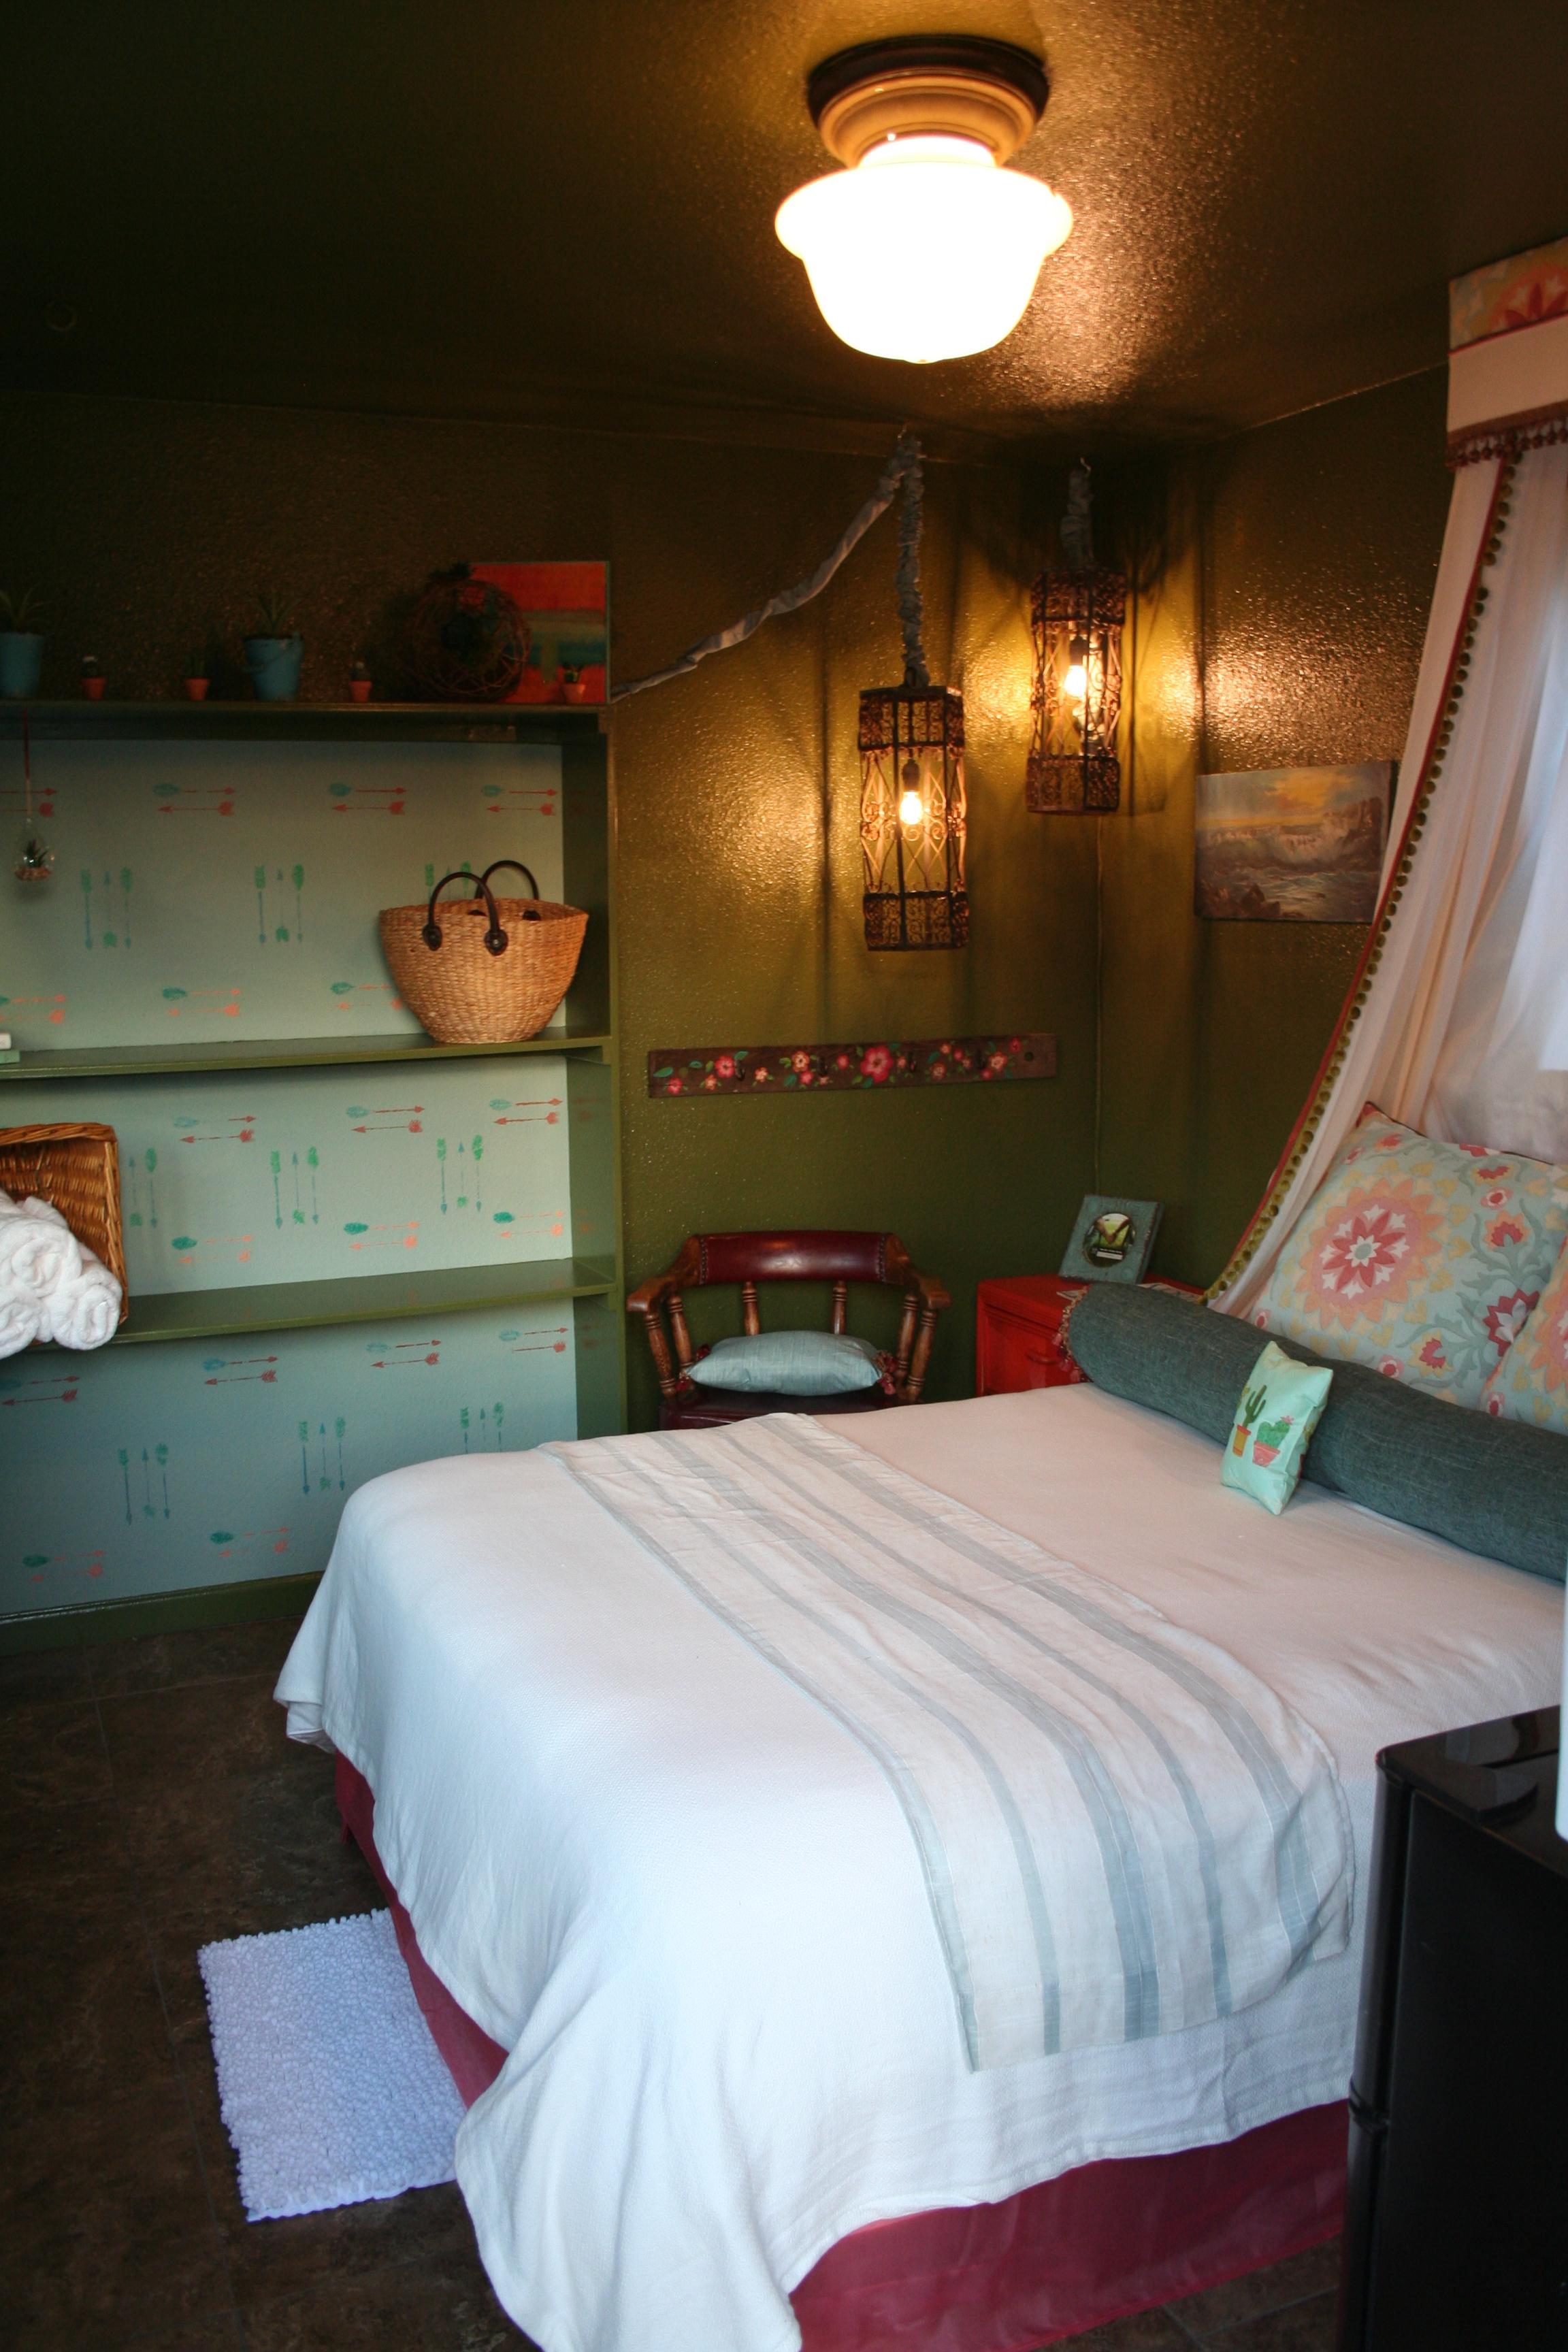 The Sol Shack is the Yoga Shack's stylish, boho chic accommodations.